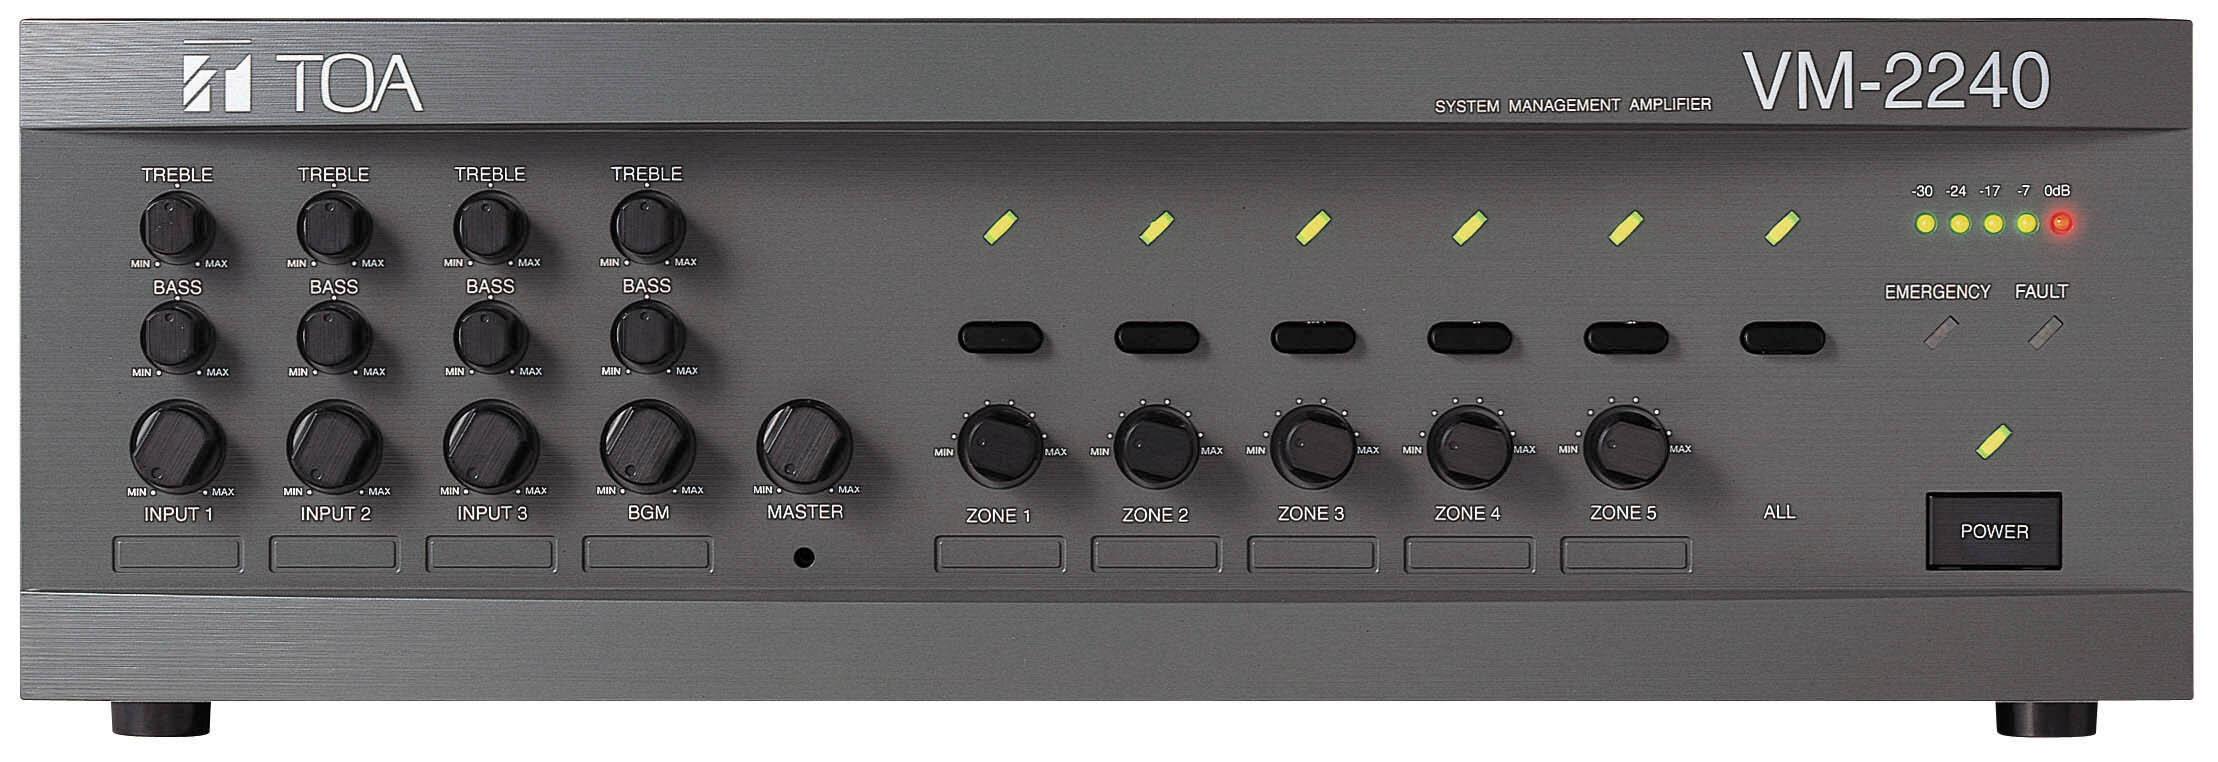 TOA VM-2240 VM-2000 Series Amplifier, 240W